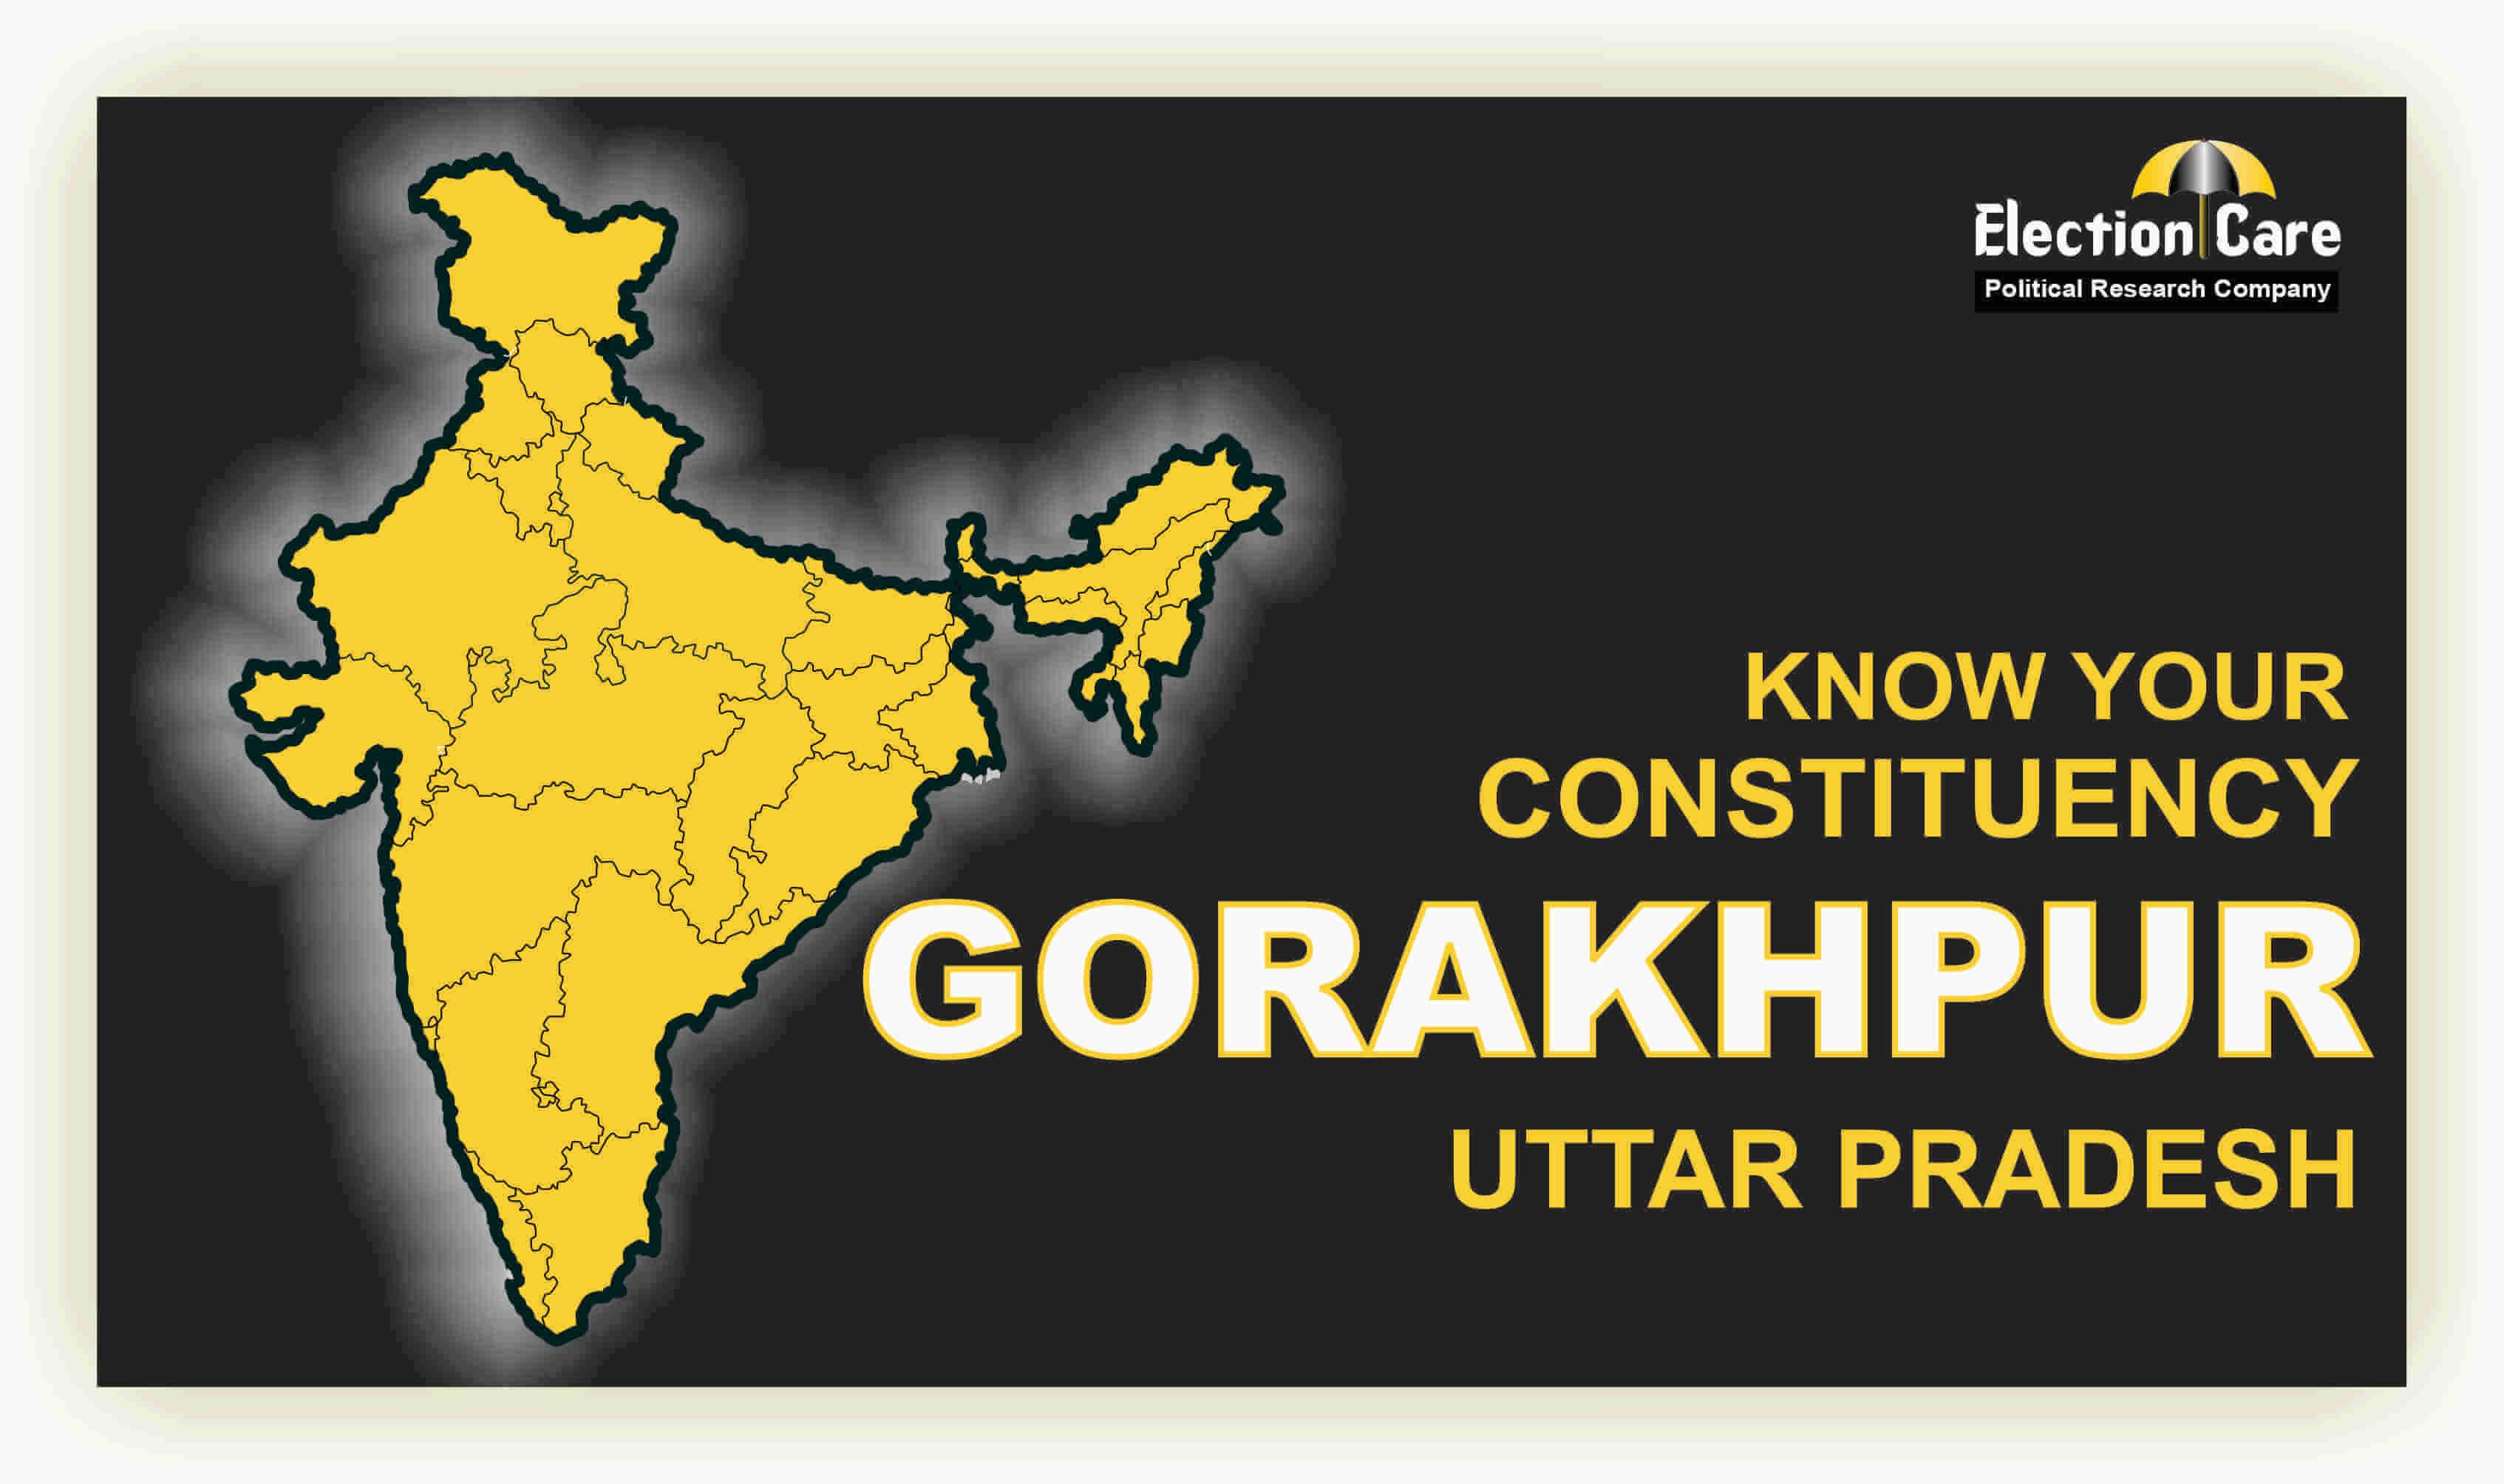 Gorakhpur Parliament Election Result